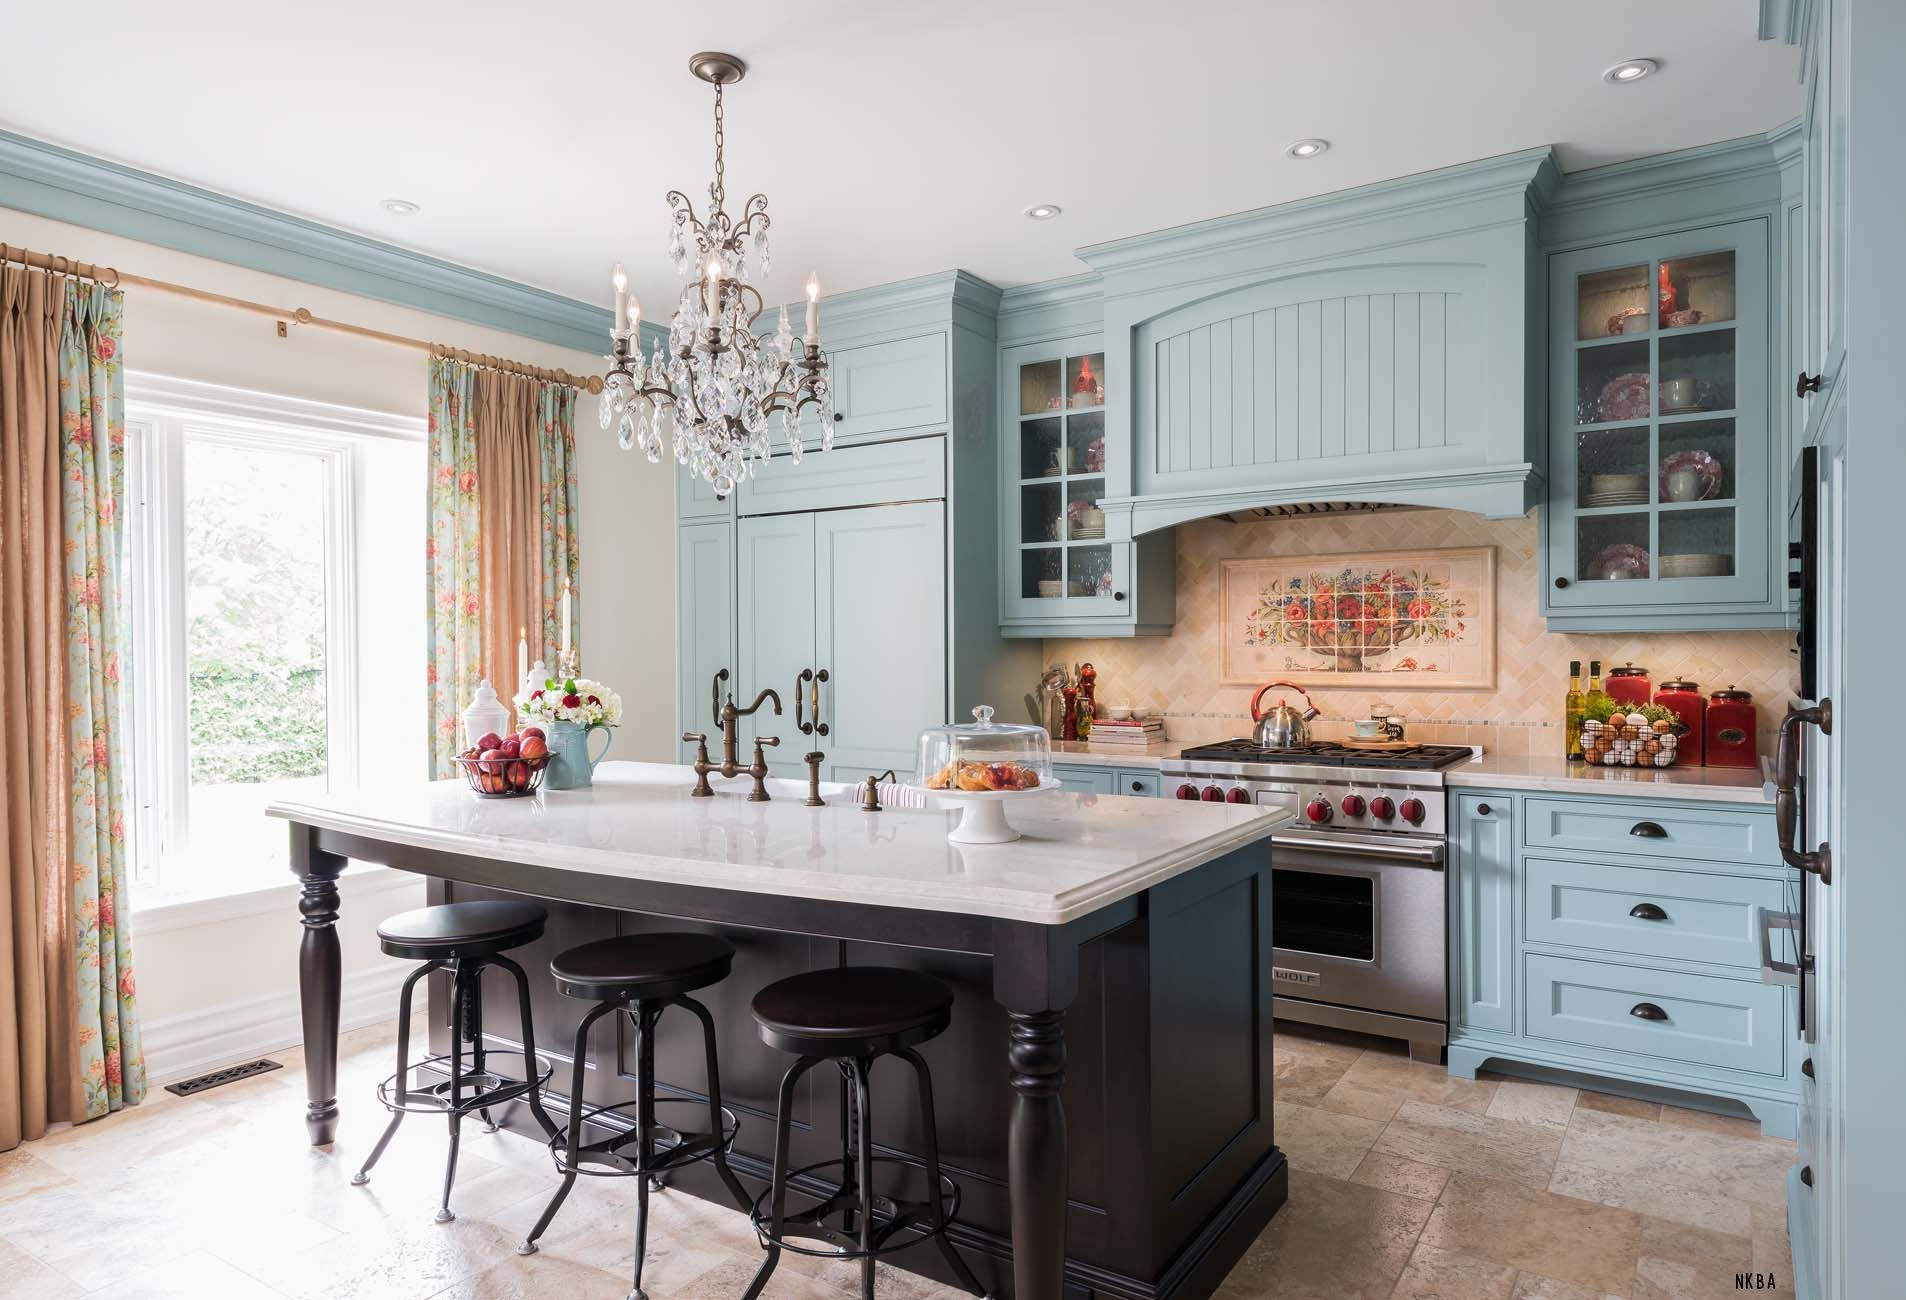 Diy tips for how to paint kitchen u bathroom cabinets bathroom